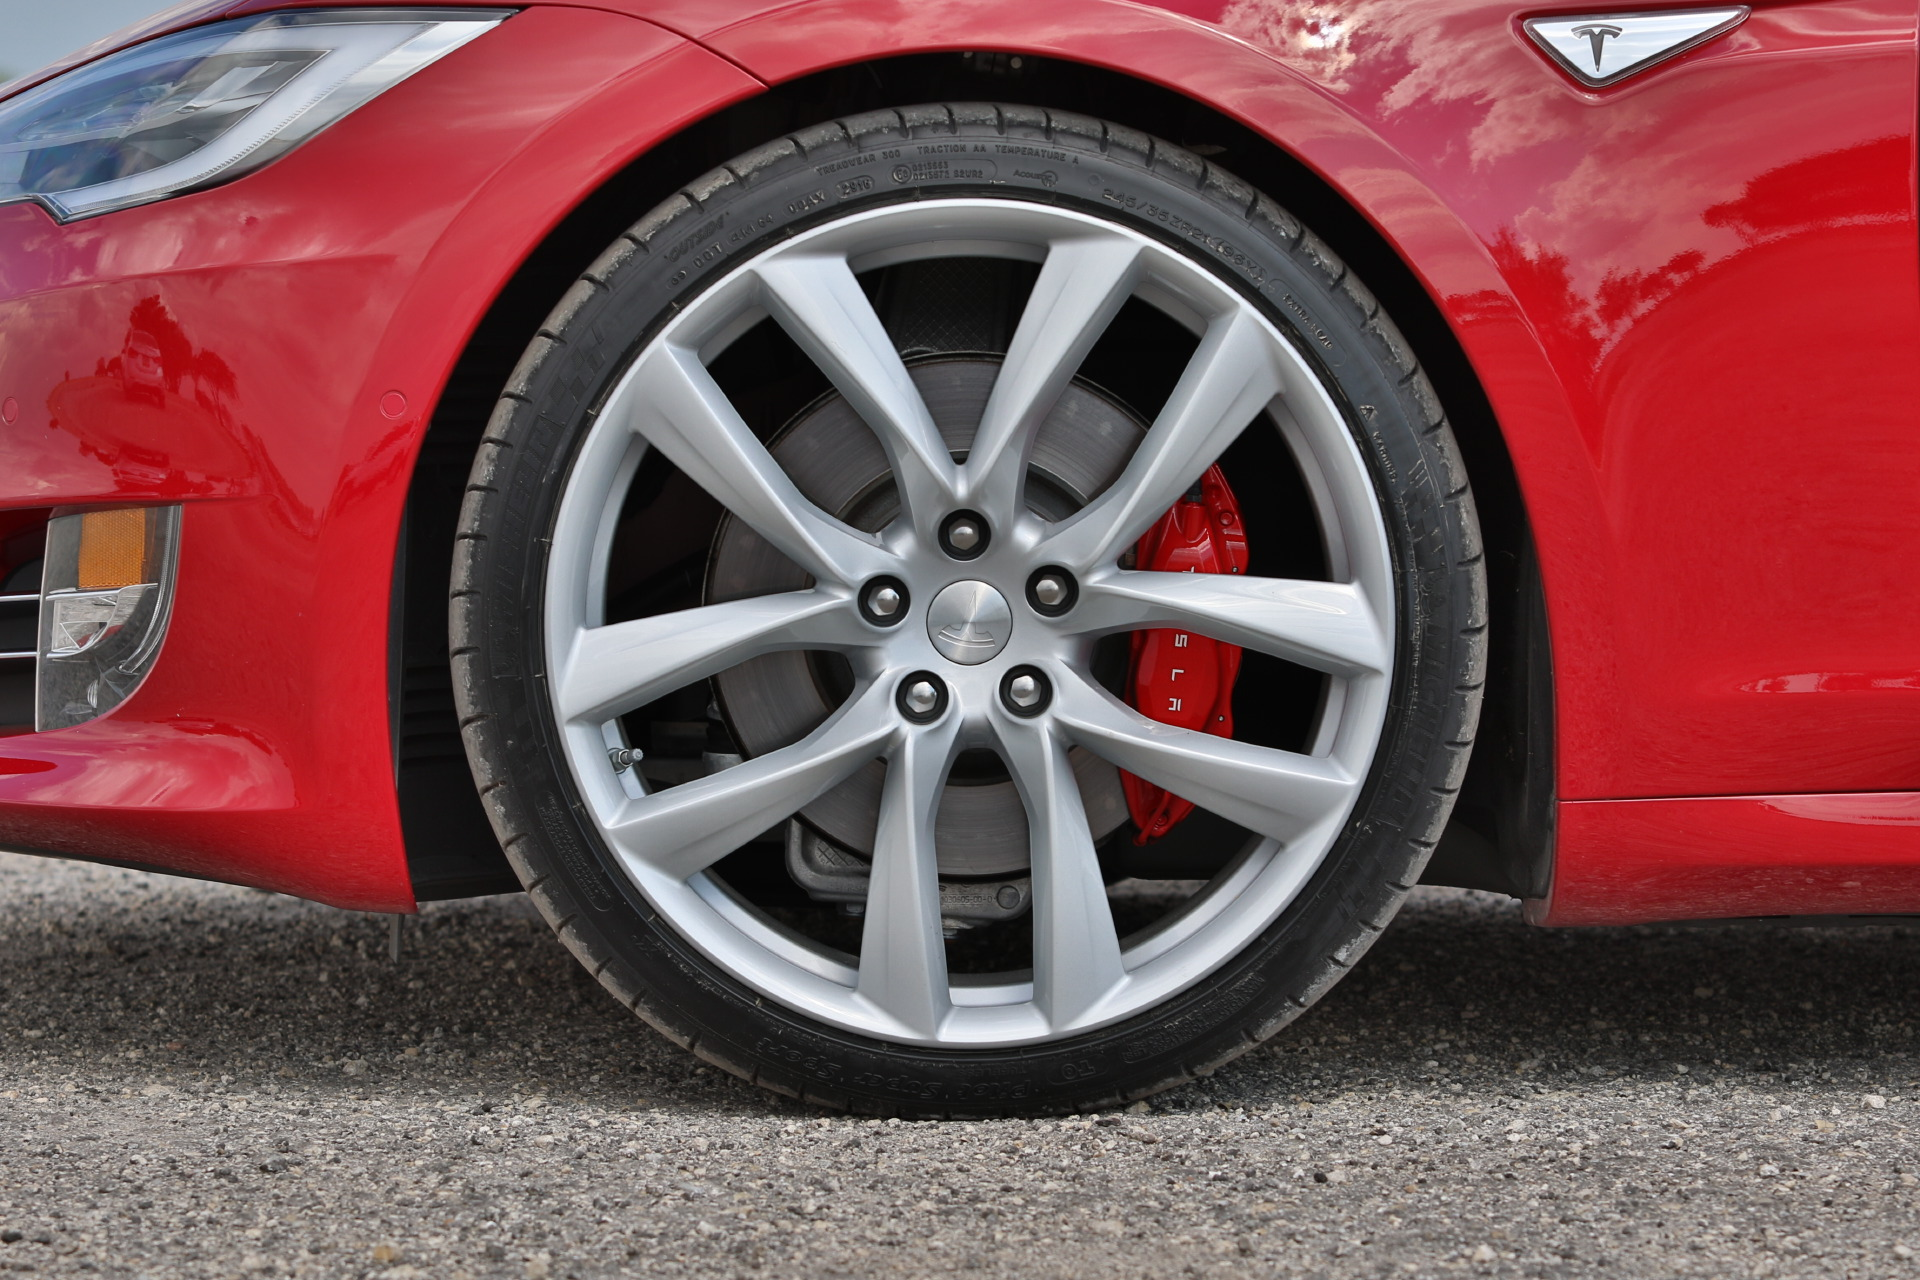 2016-Tesla-Model-S-P100D-Multi-Coat-Red-Arachnid-Wheels-016.JPG